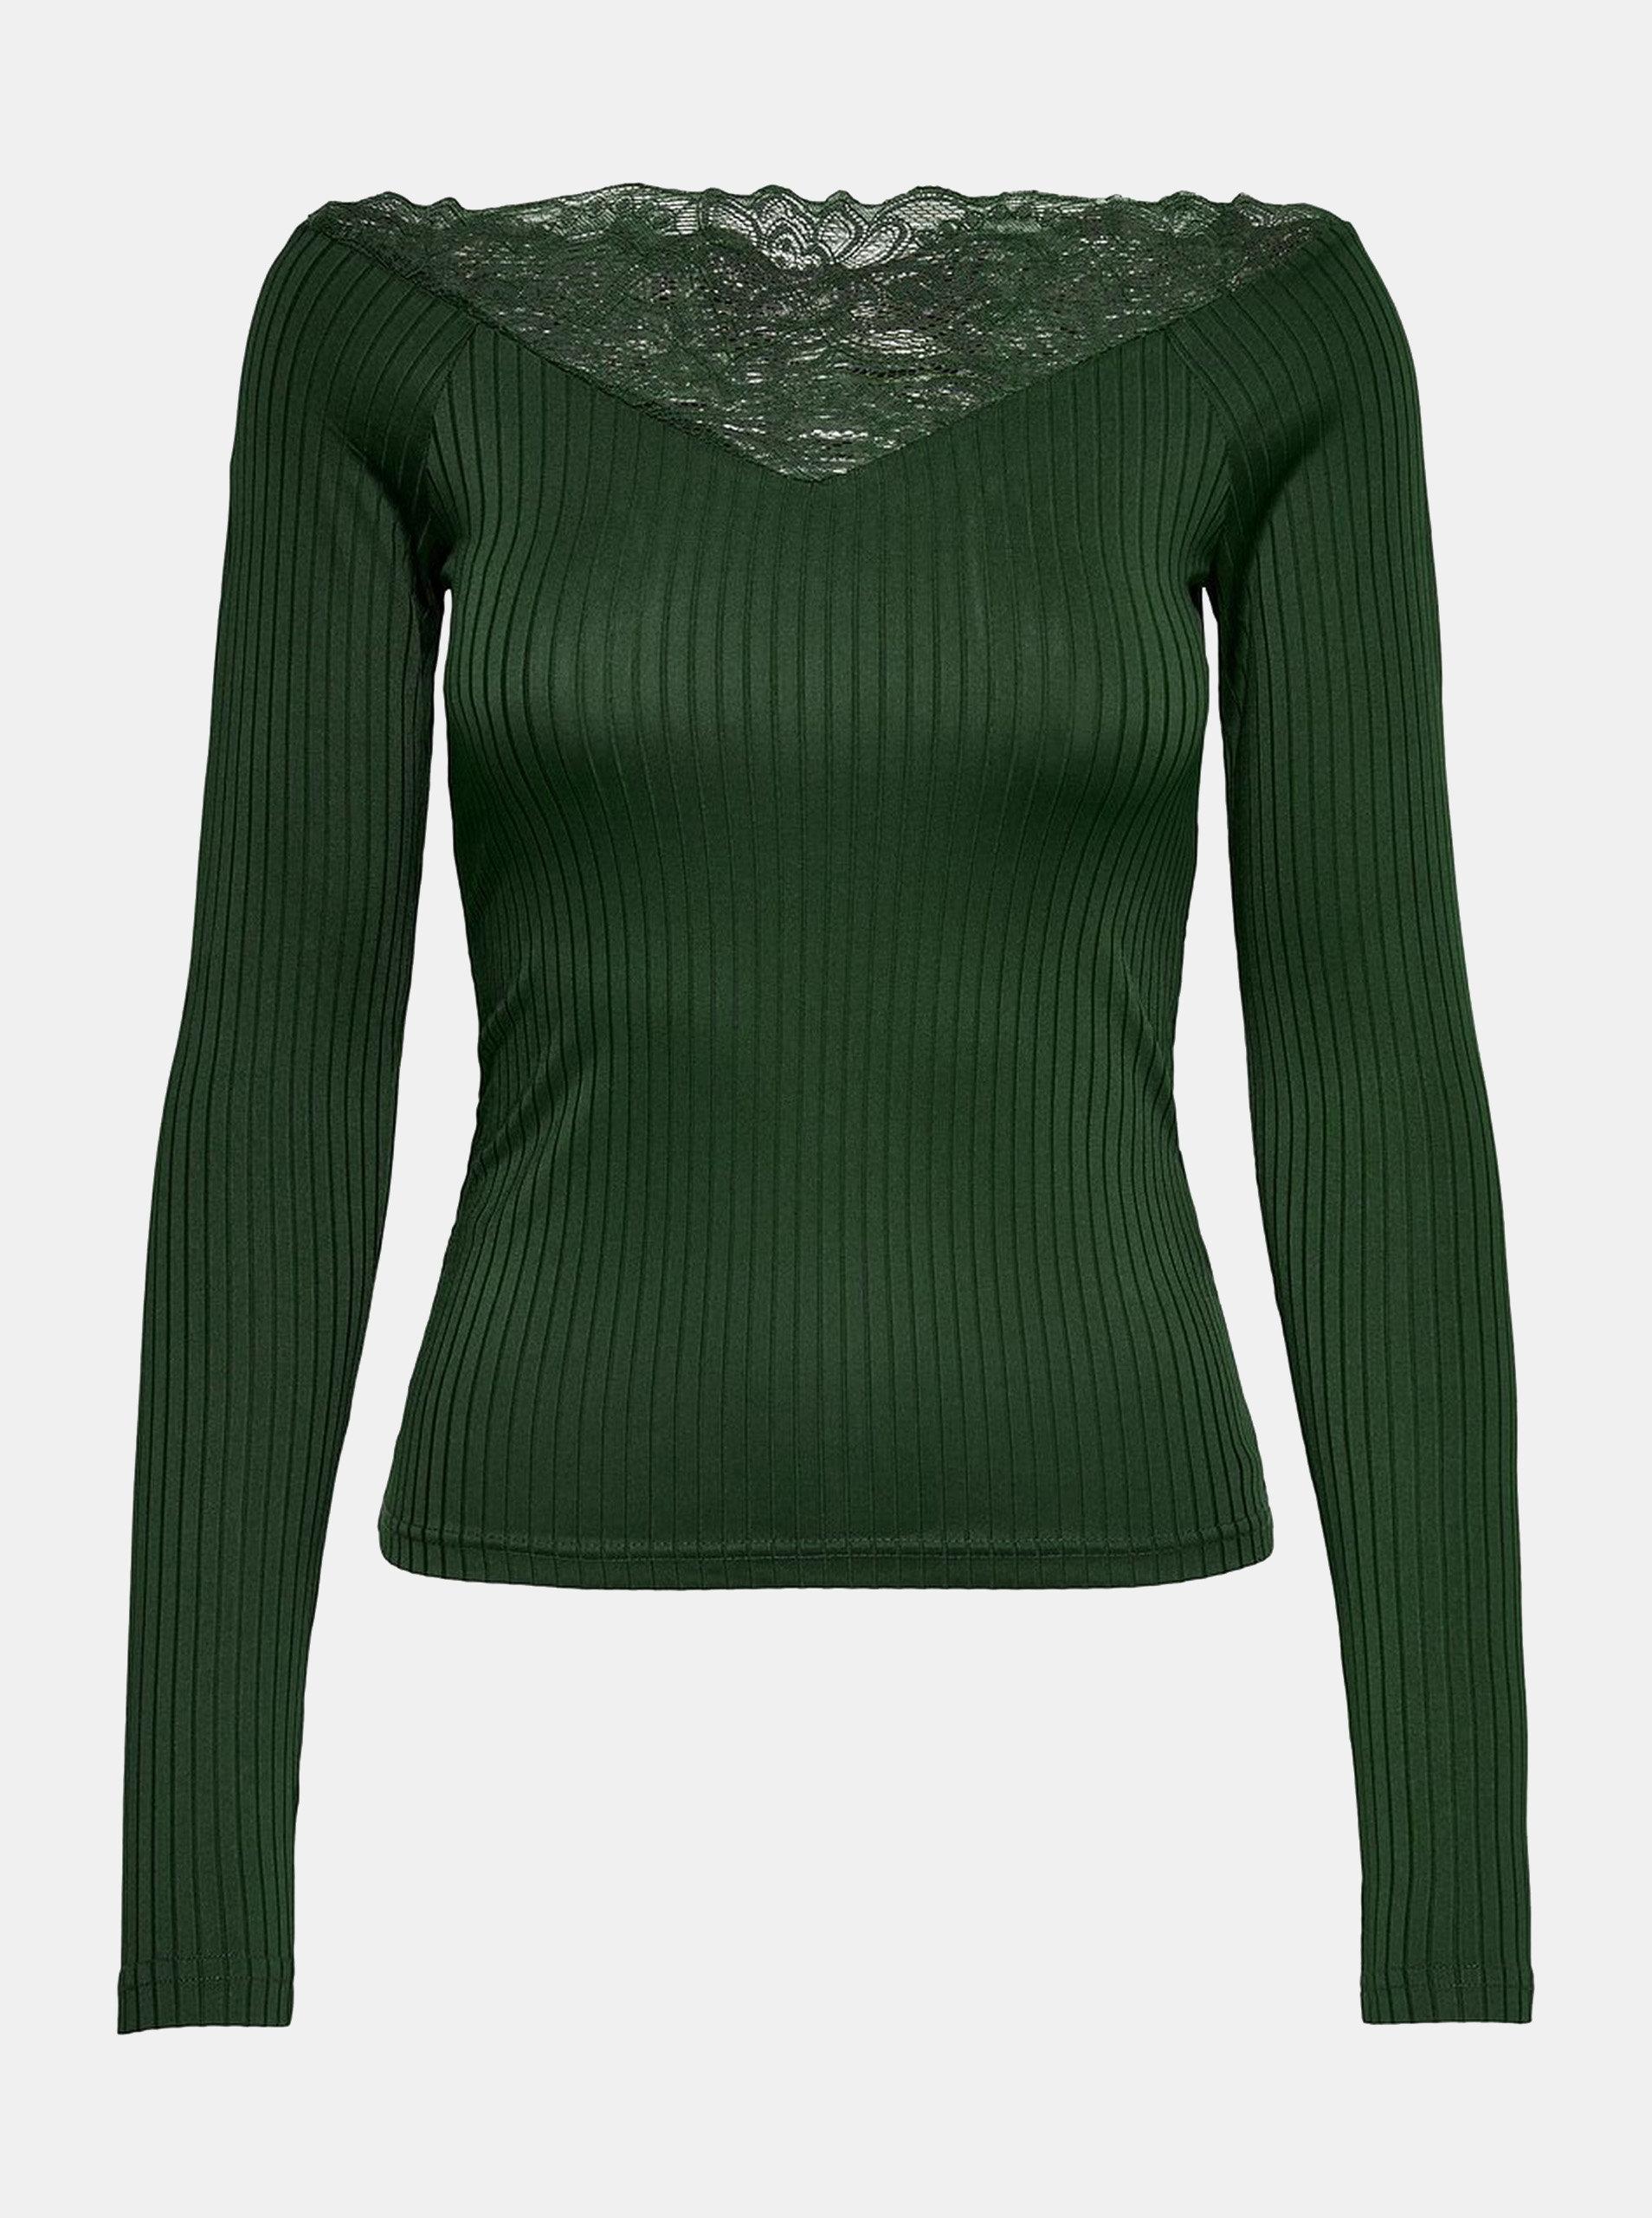 352c5d96ce Tmavozelené rebrované tričko s čipkovanými detailmi Jacqueline de Yong Rine  ...